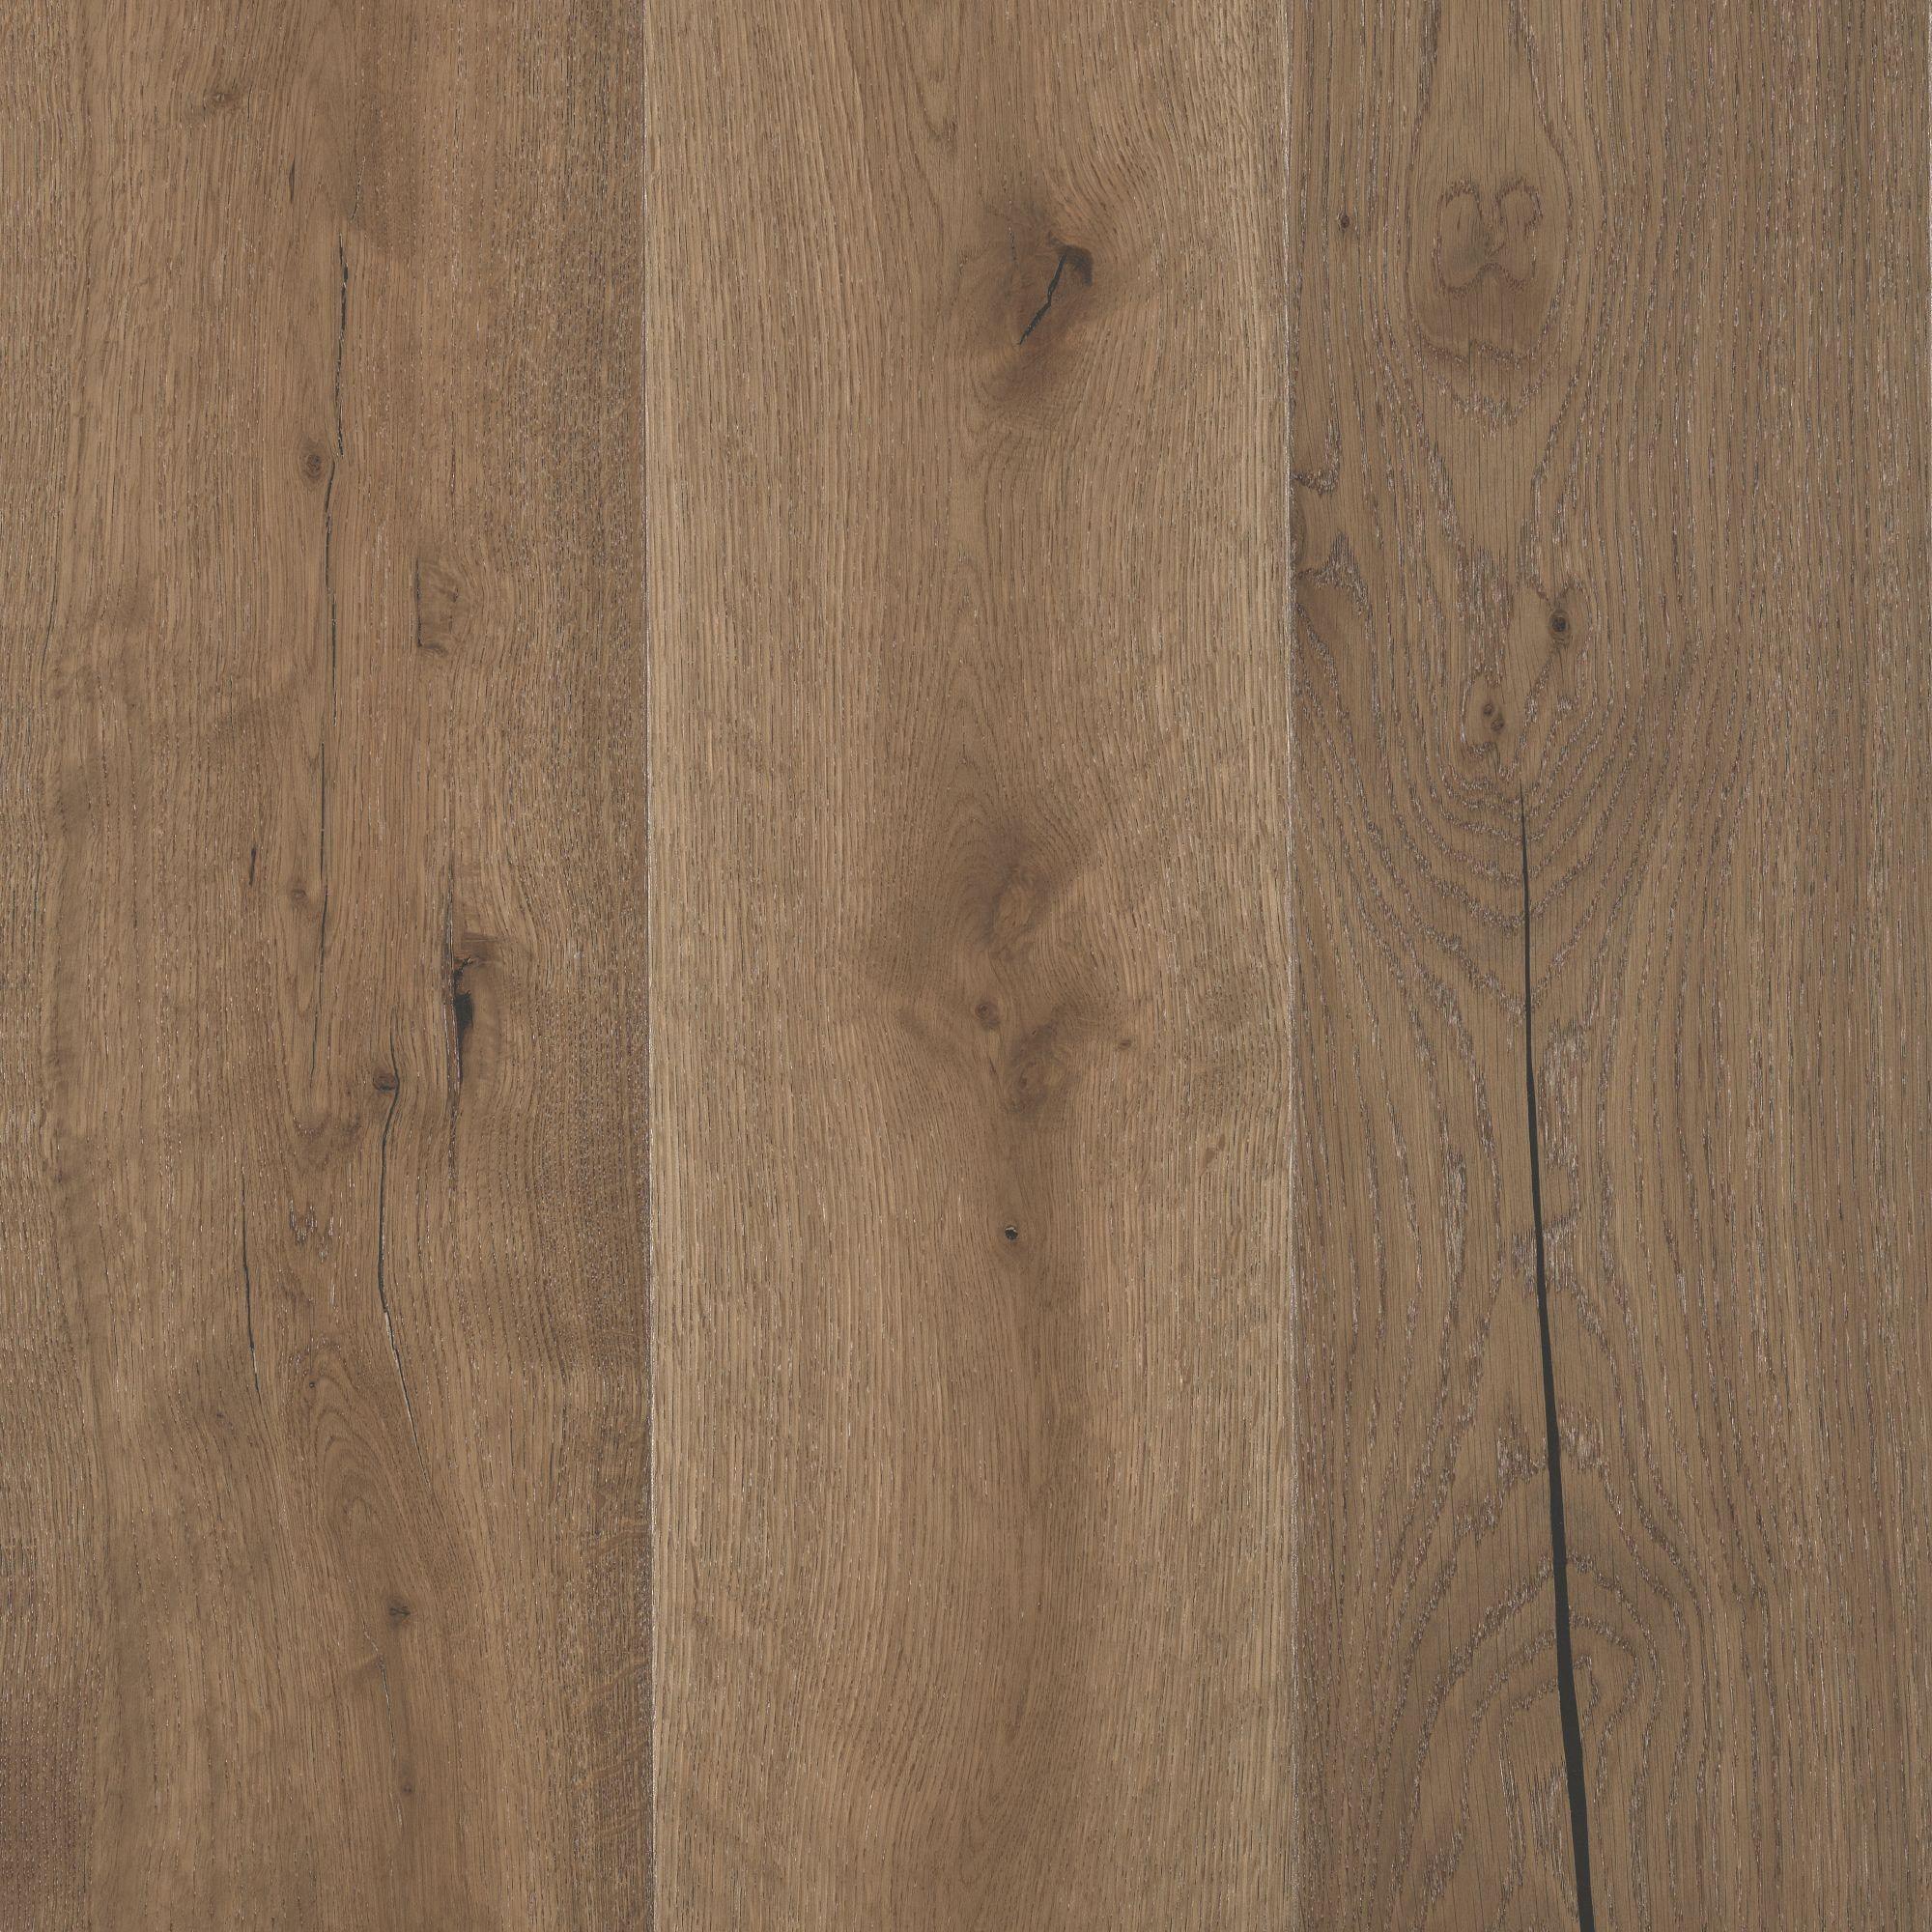 Mohawk Flooring Engineered Hardwood Arbordale Collection With Images Oak Engineered Hardwood Engineered Hardwood